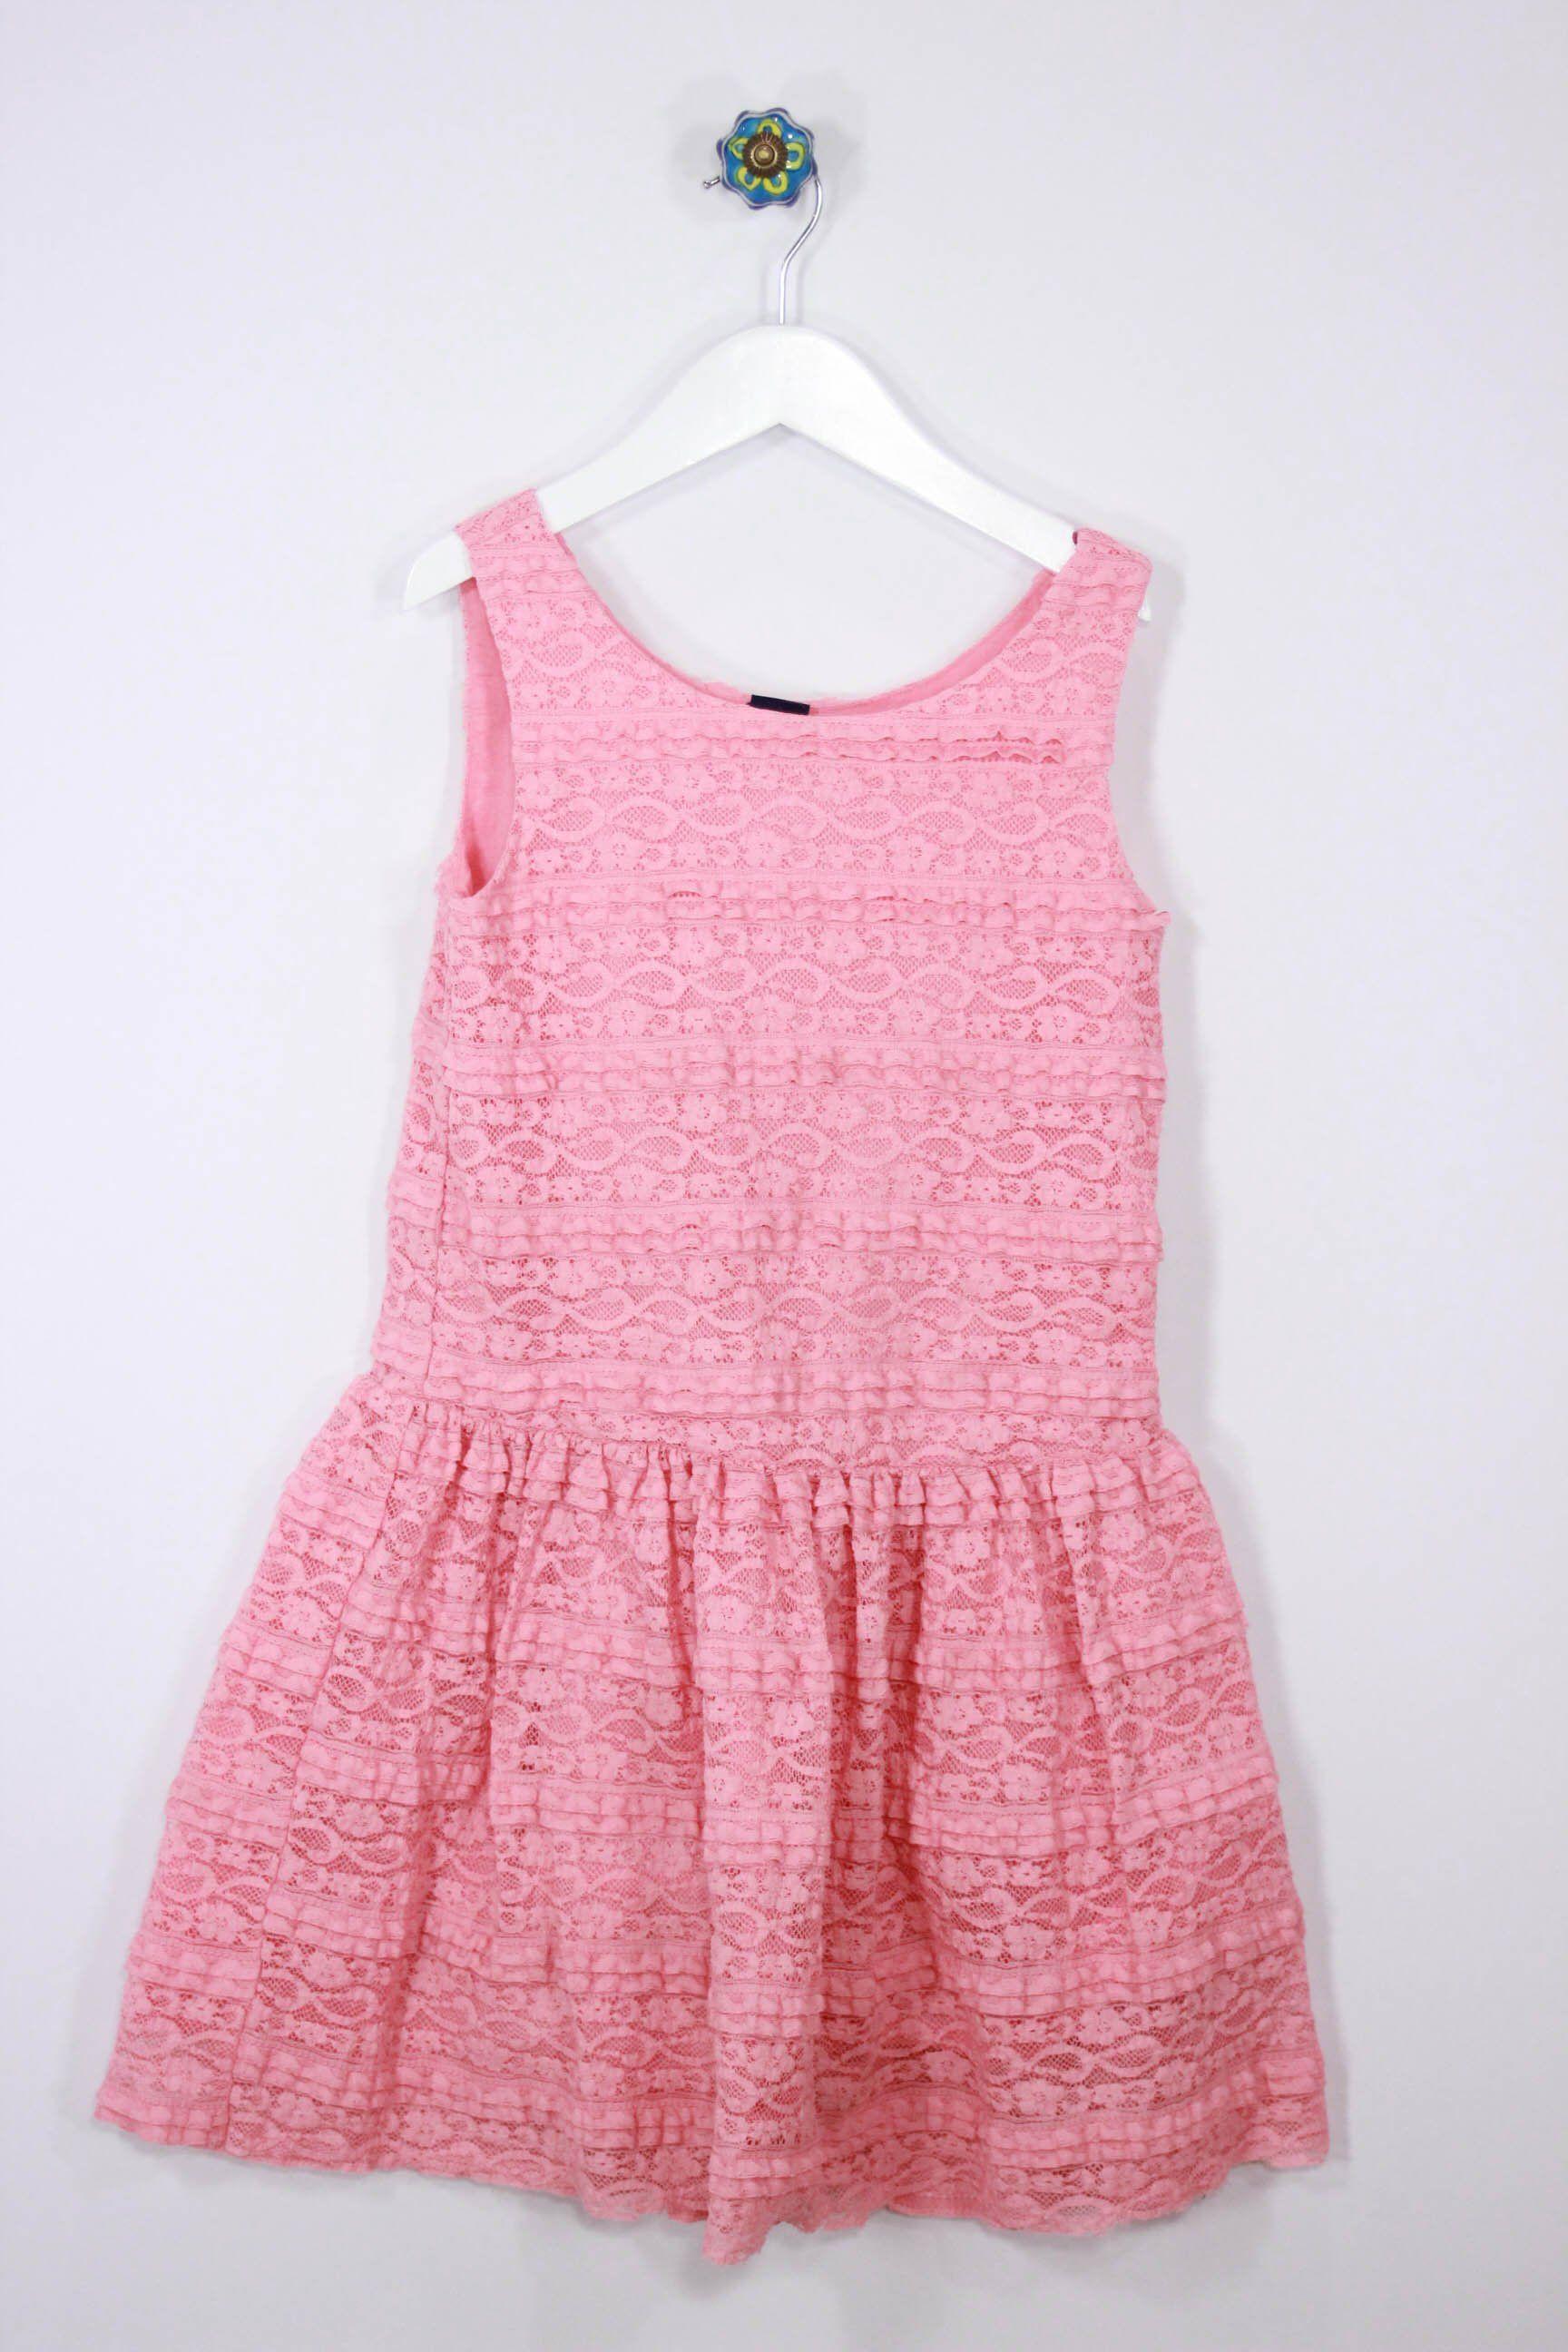 GAP Kids Size 7/8 Peach Lace Dress